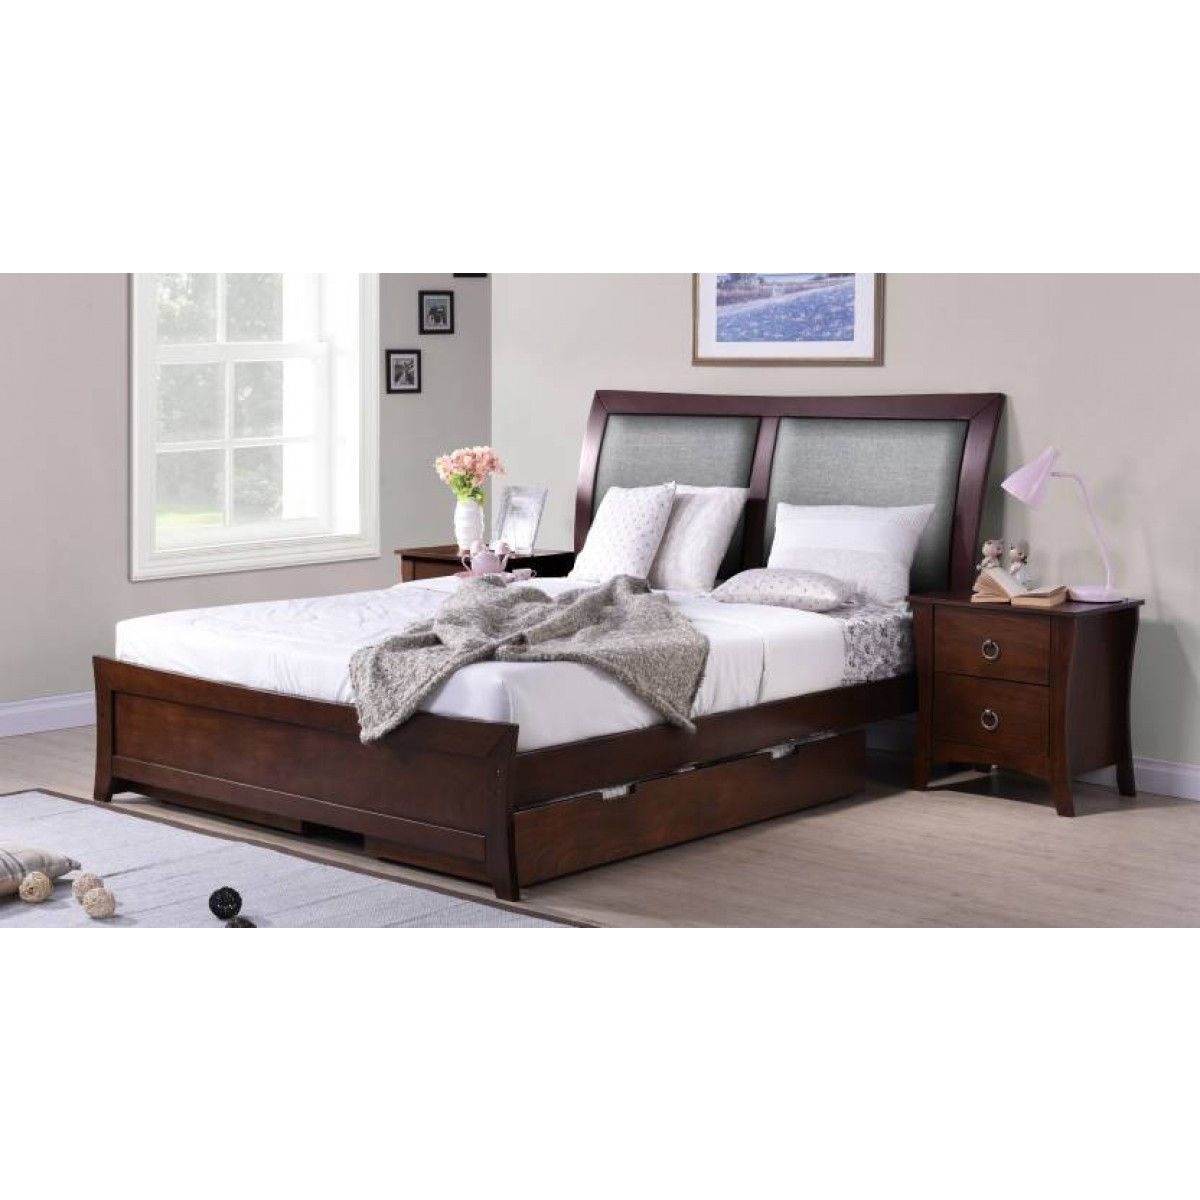 Wichita Wooden King Size Bed Finish Color Dark Walnut King